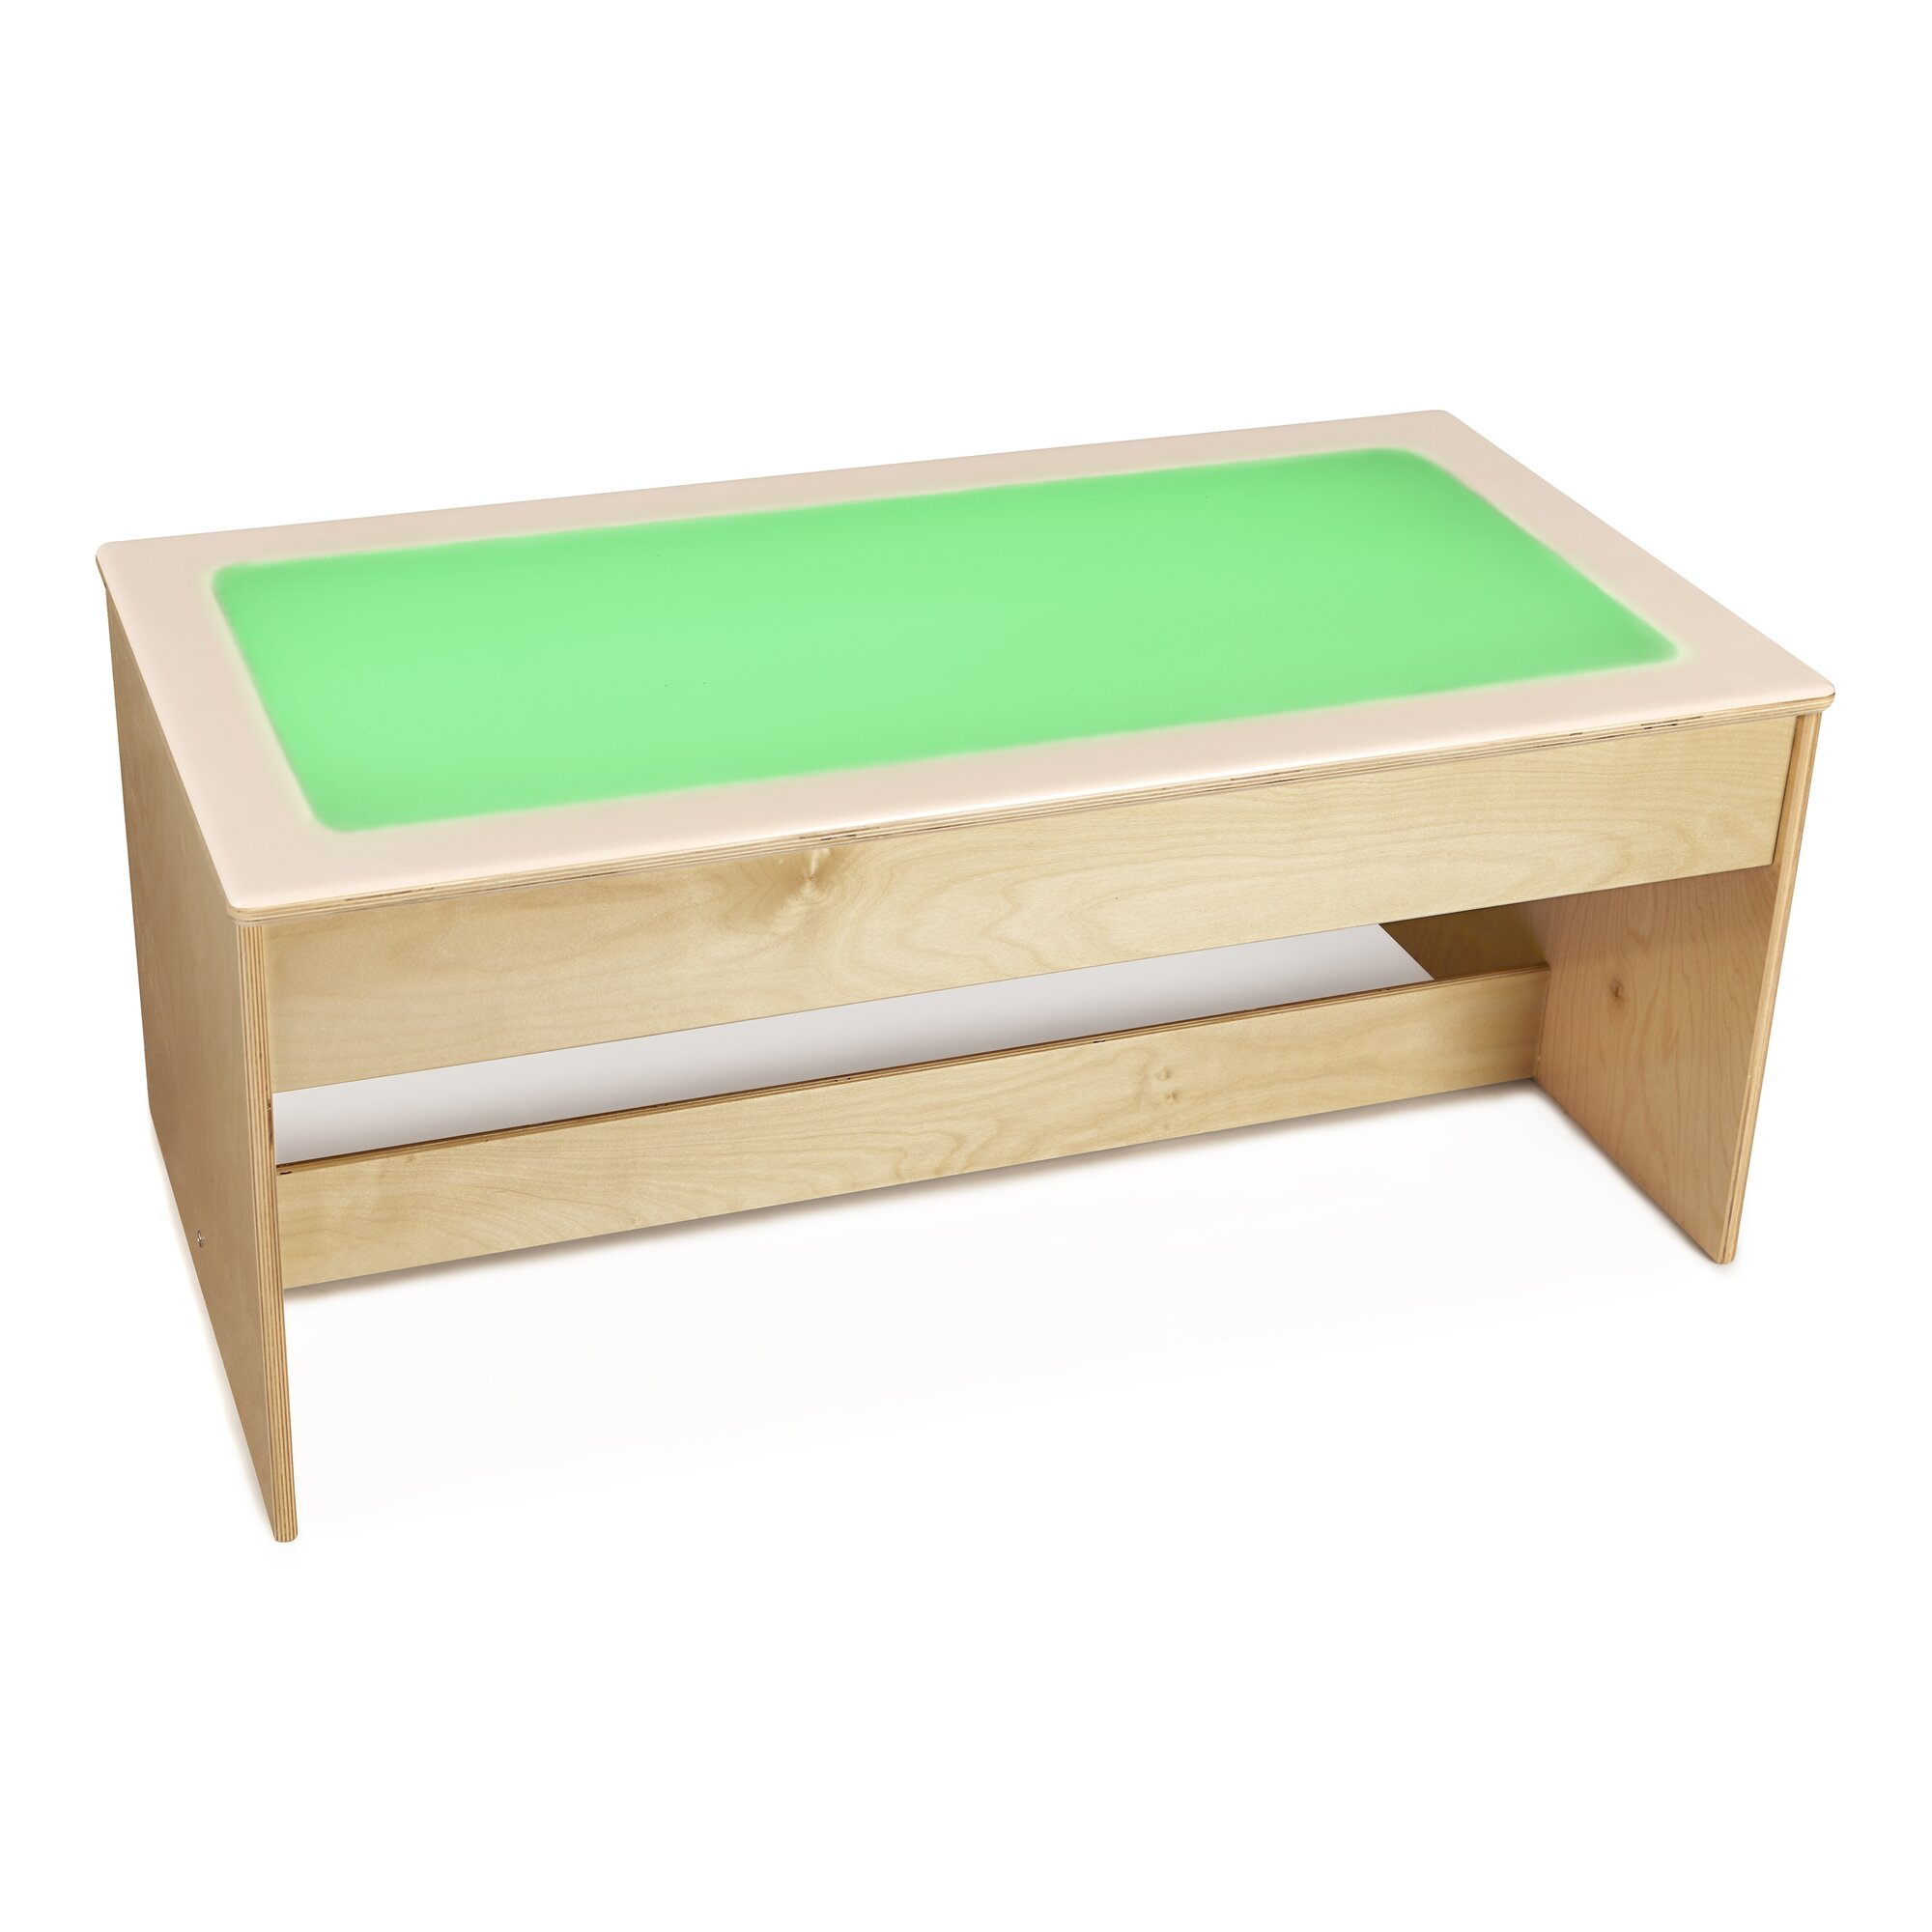 Child craft light table - Kids Rectangular Large Light Table